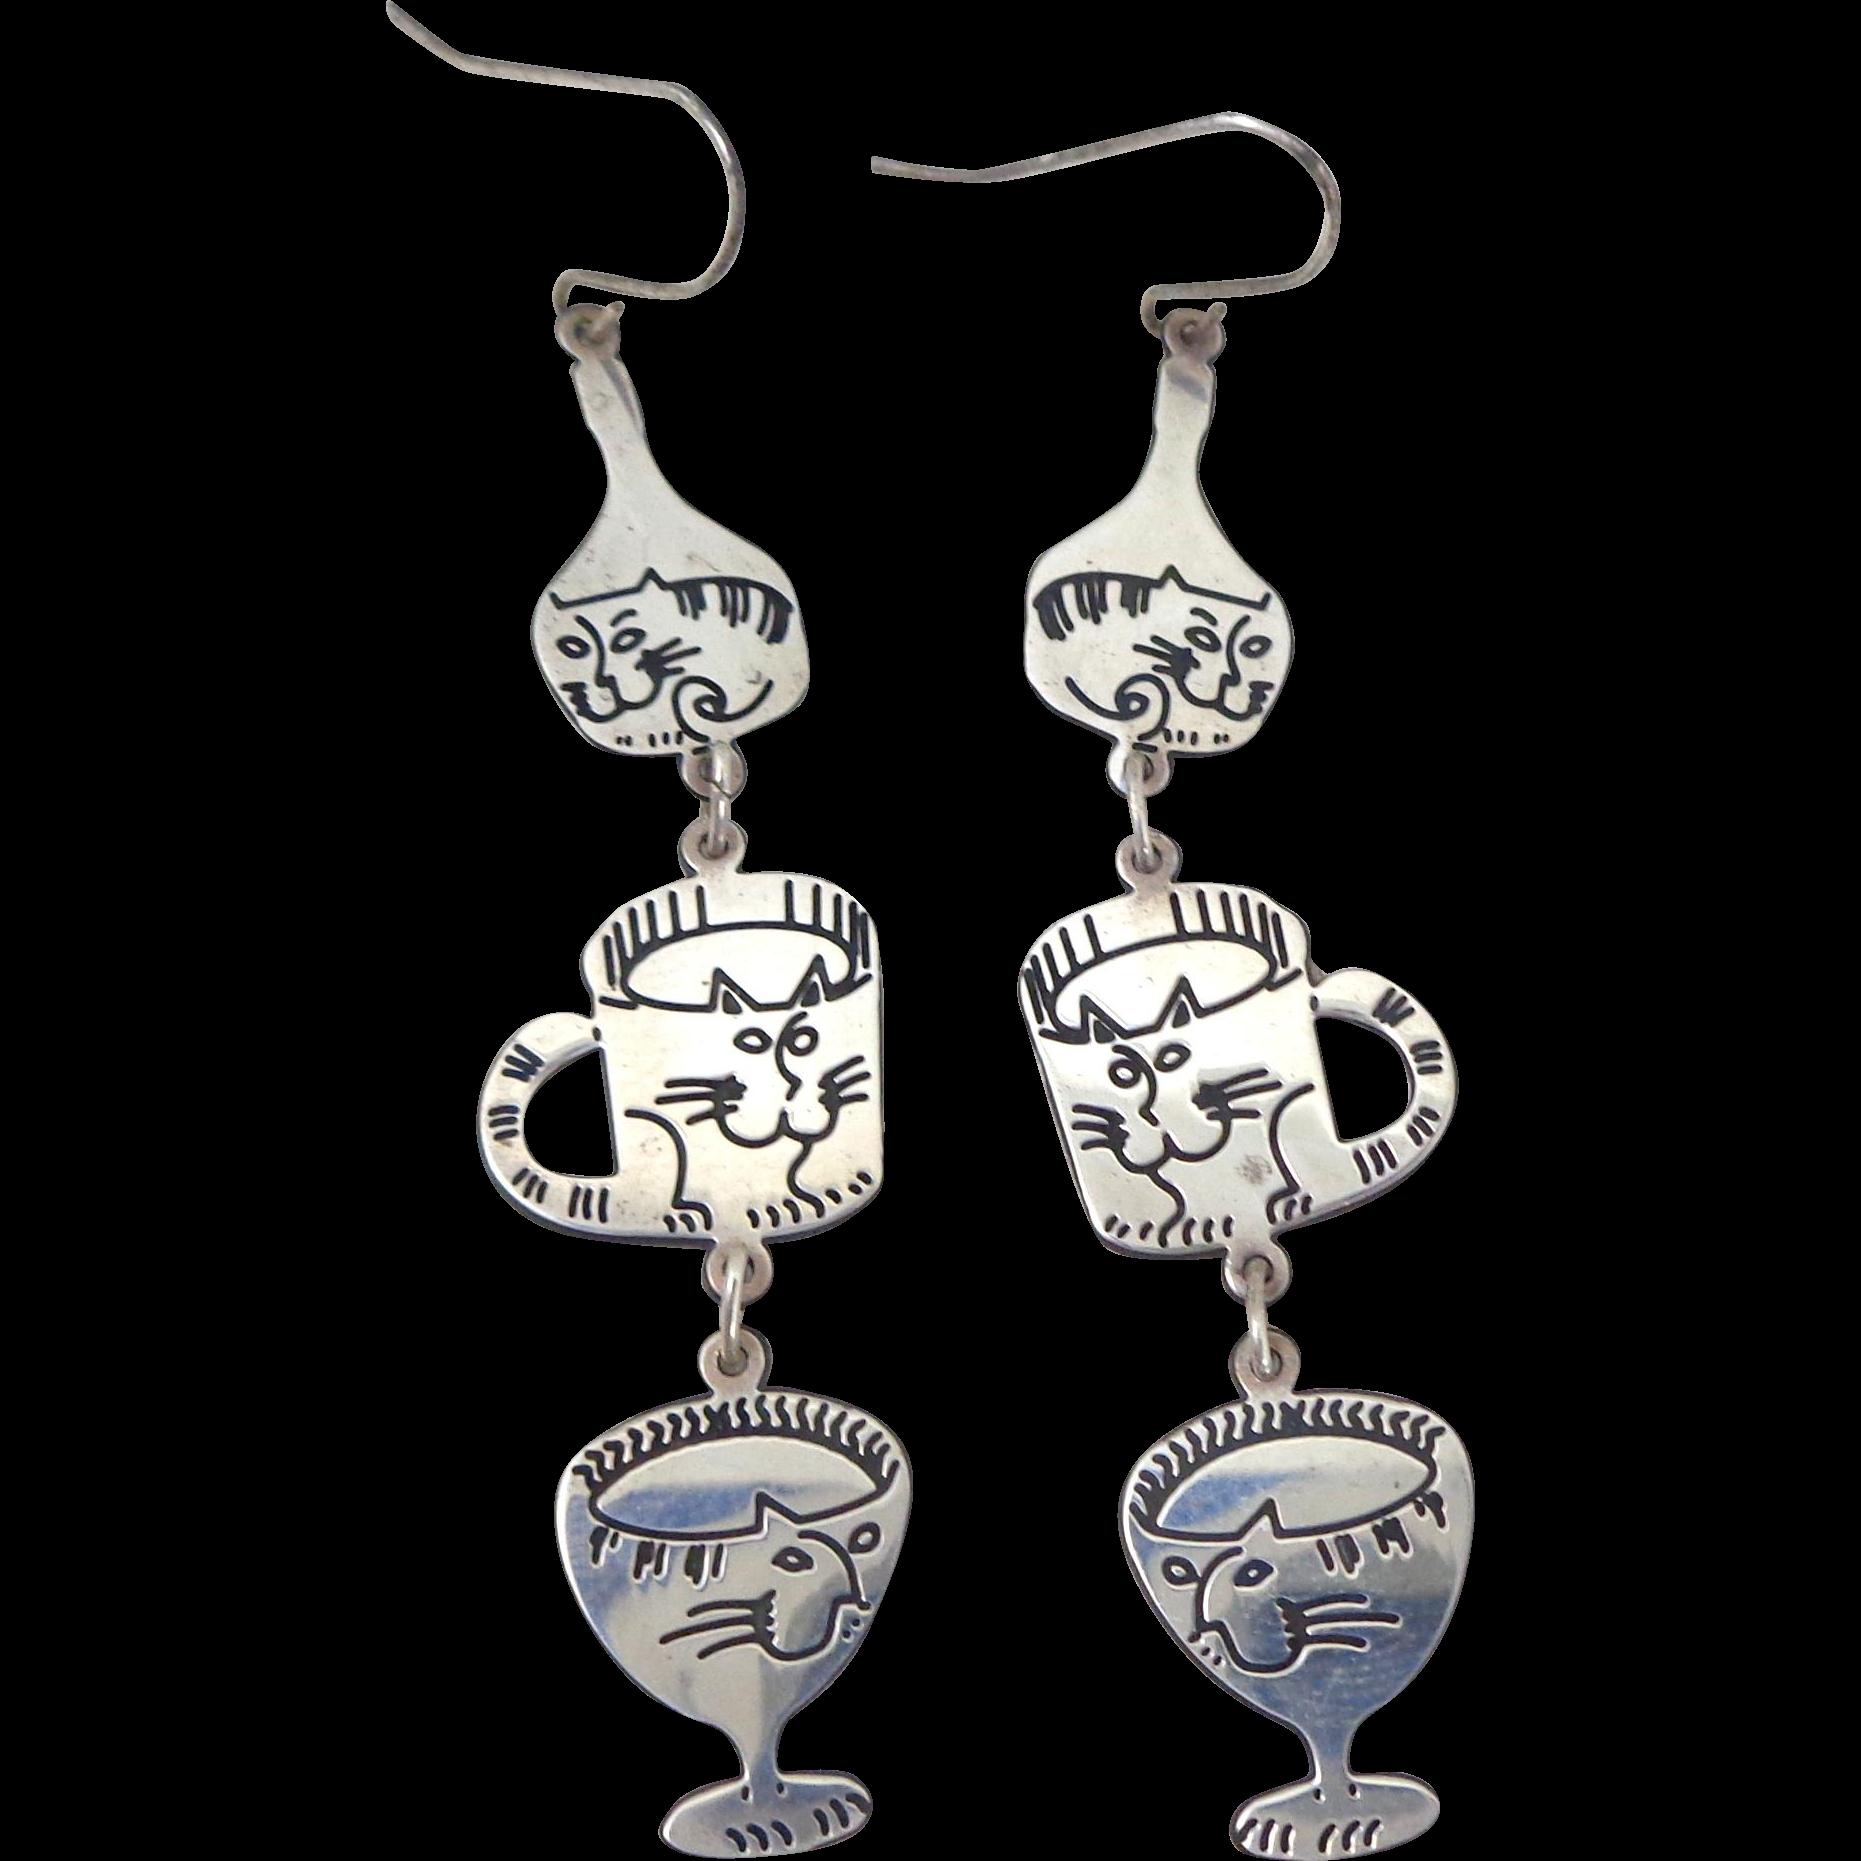 Whimsical Vintage Berebi Sterling Silver Dangling Cat Earrings